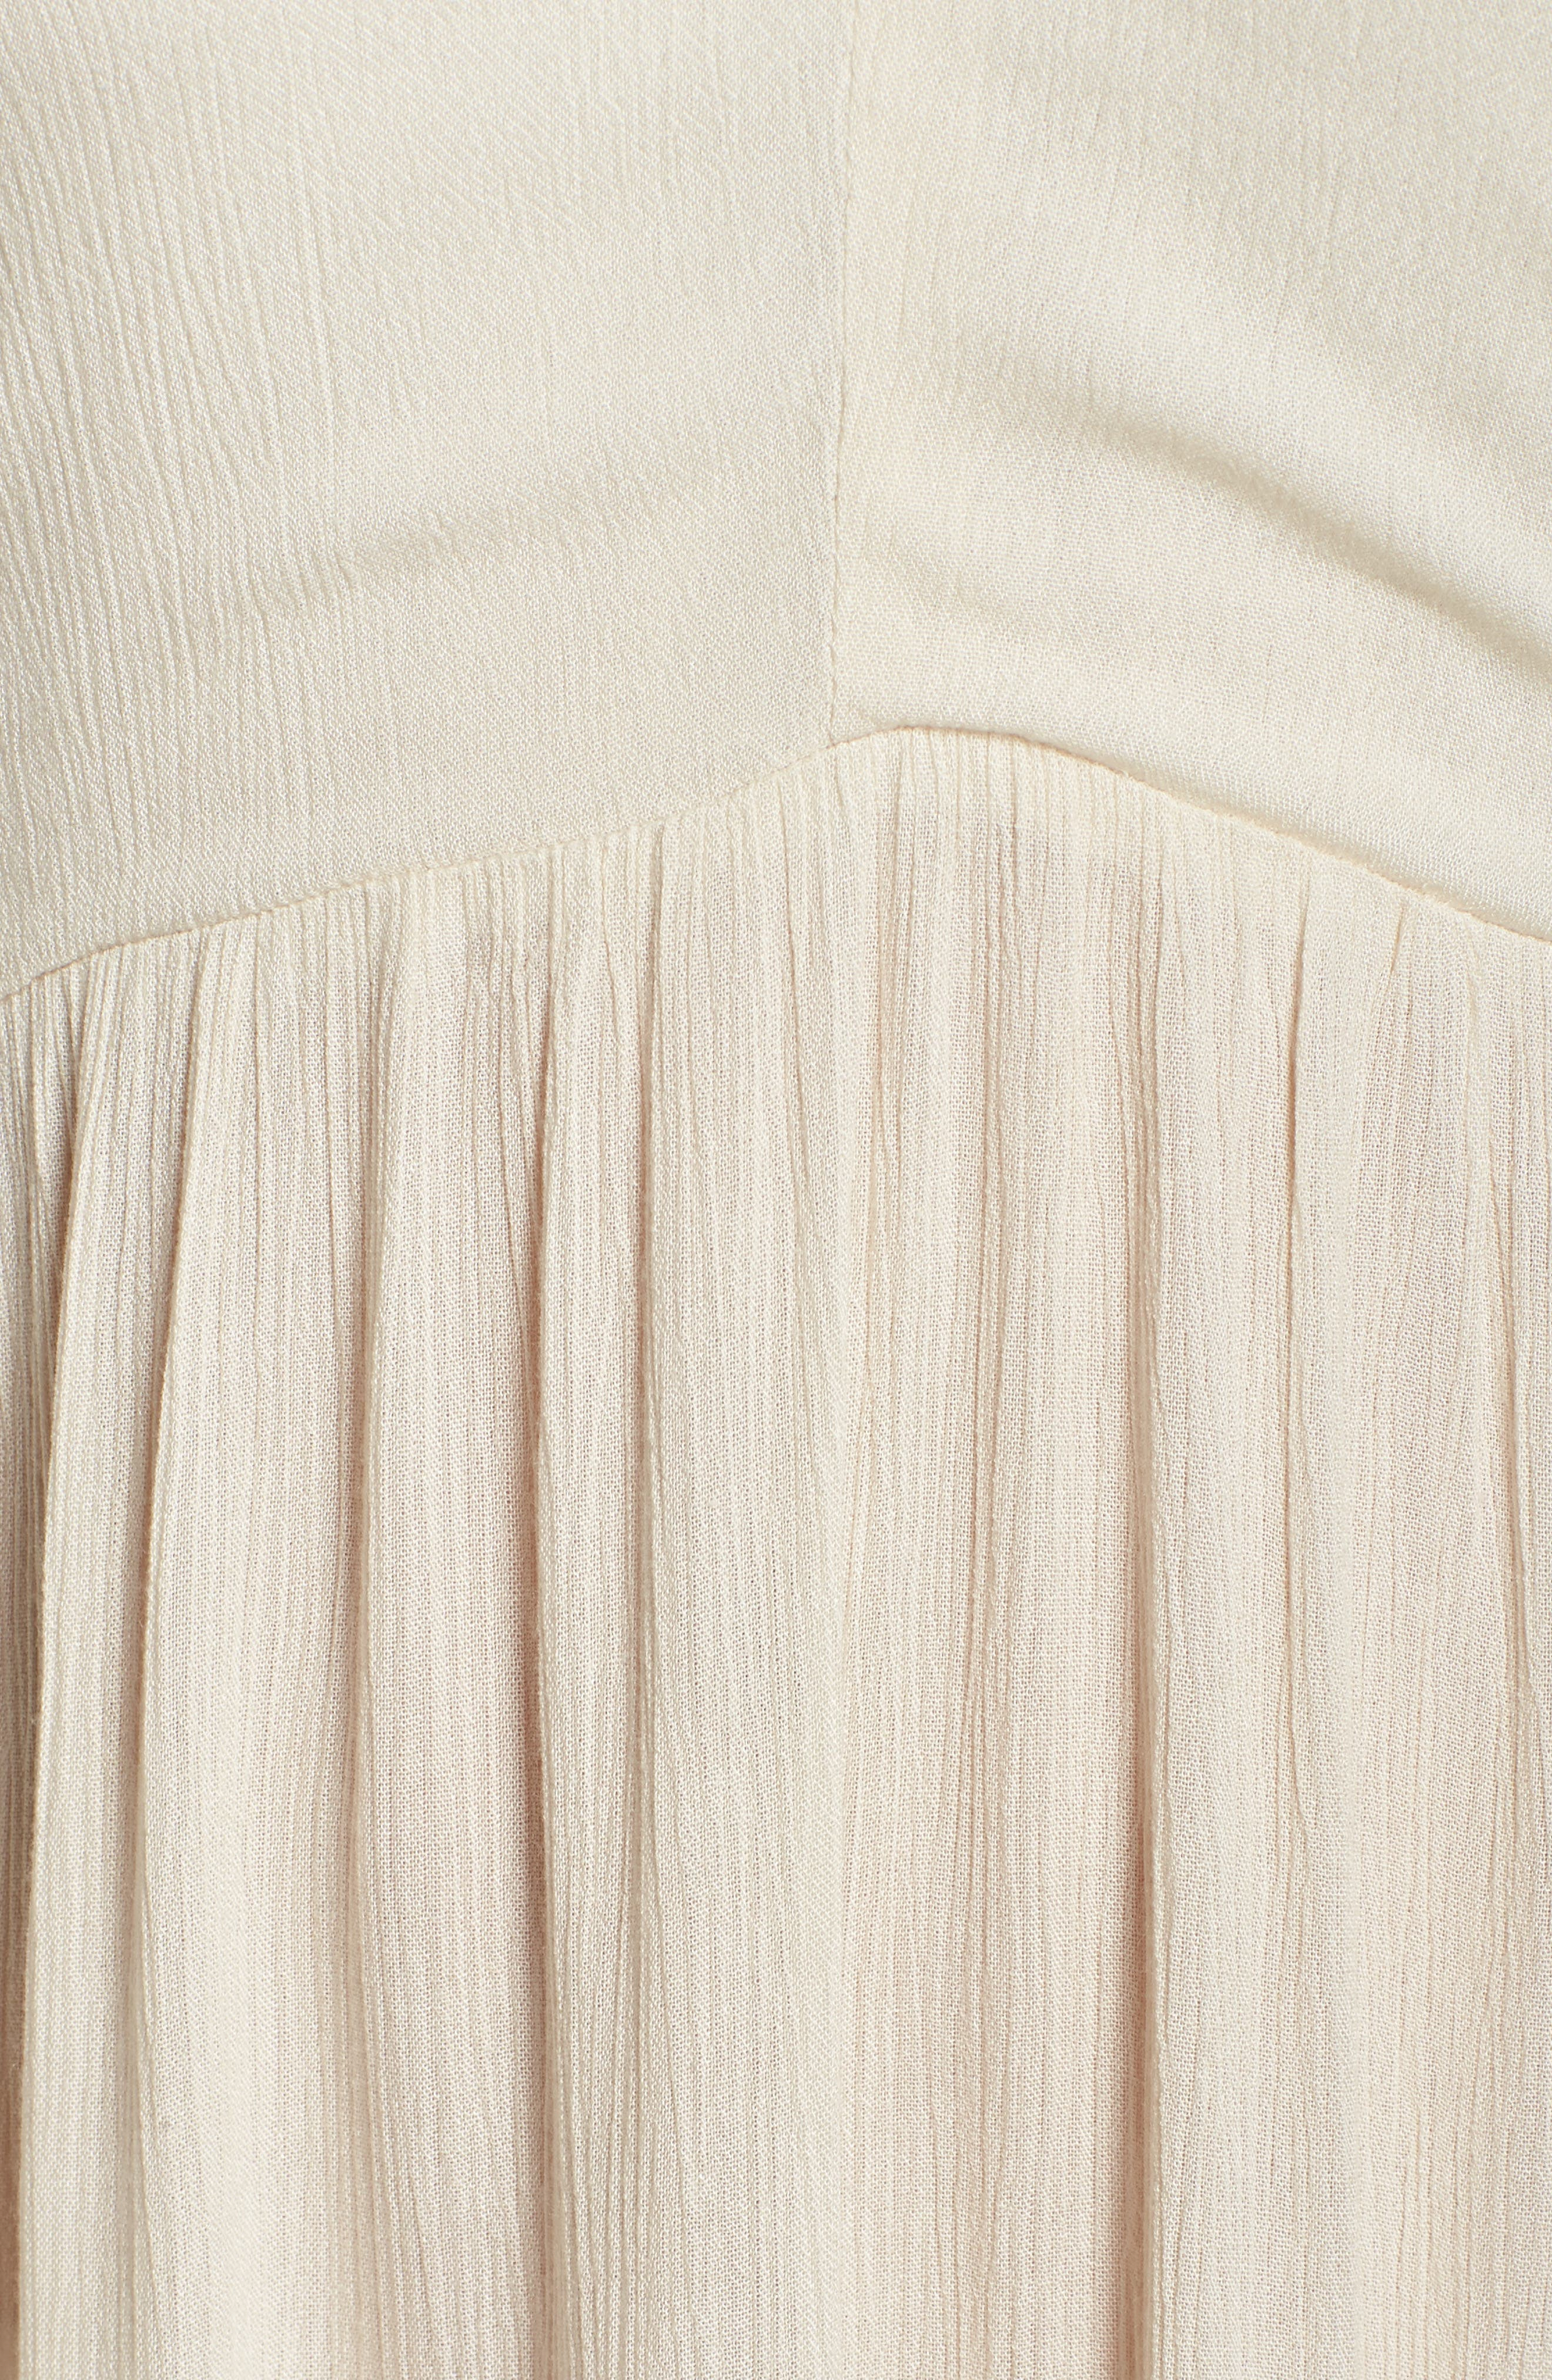 Midi Tie Back Cover-Up Dress,                             Alternate thumbnail 5, color,                             Stone